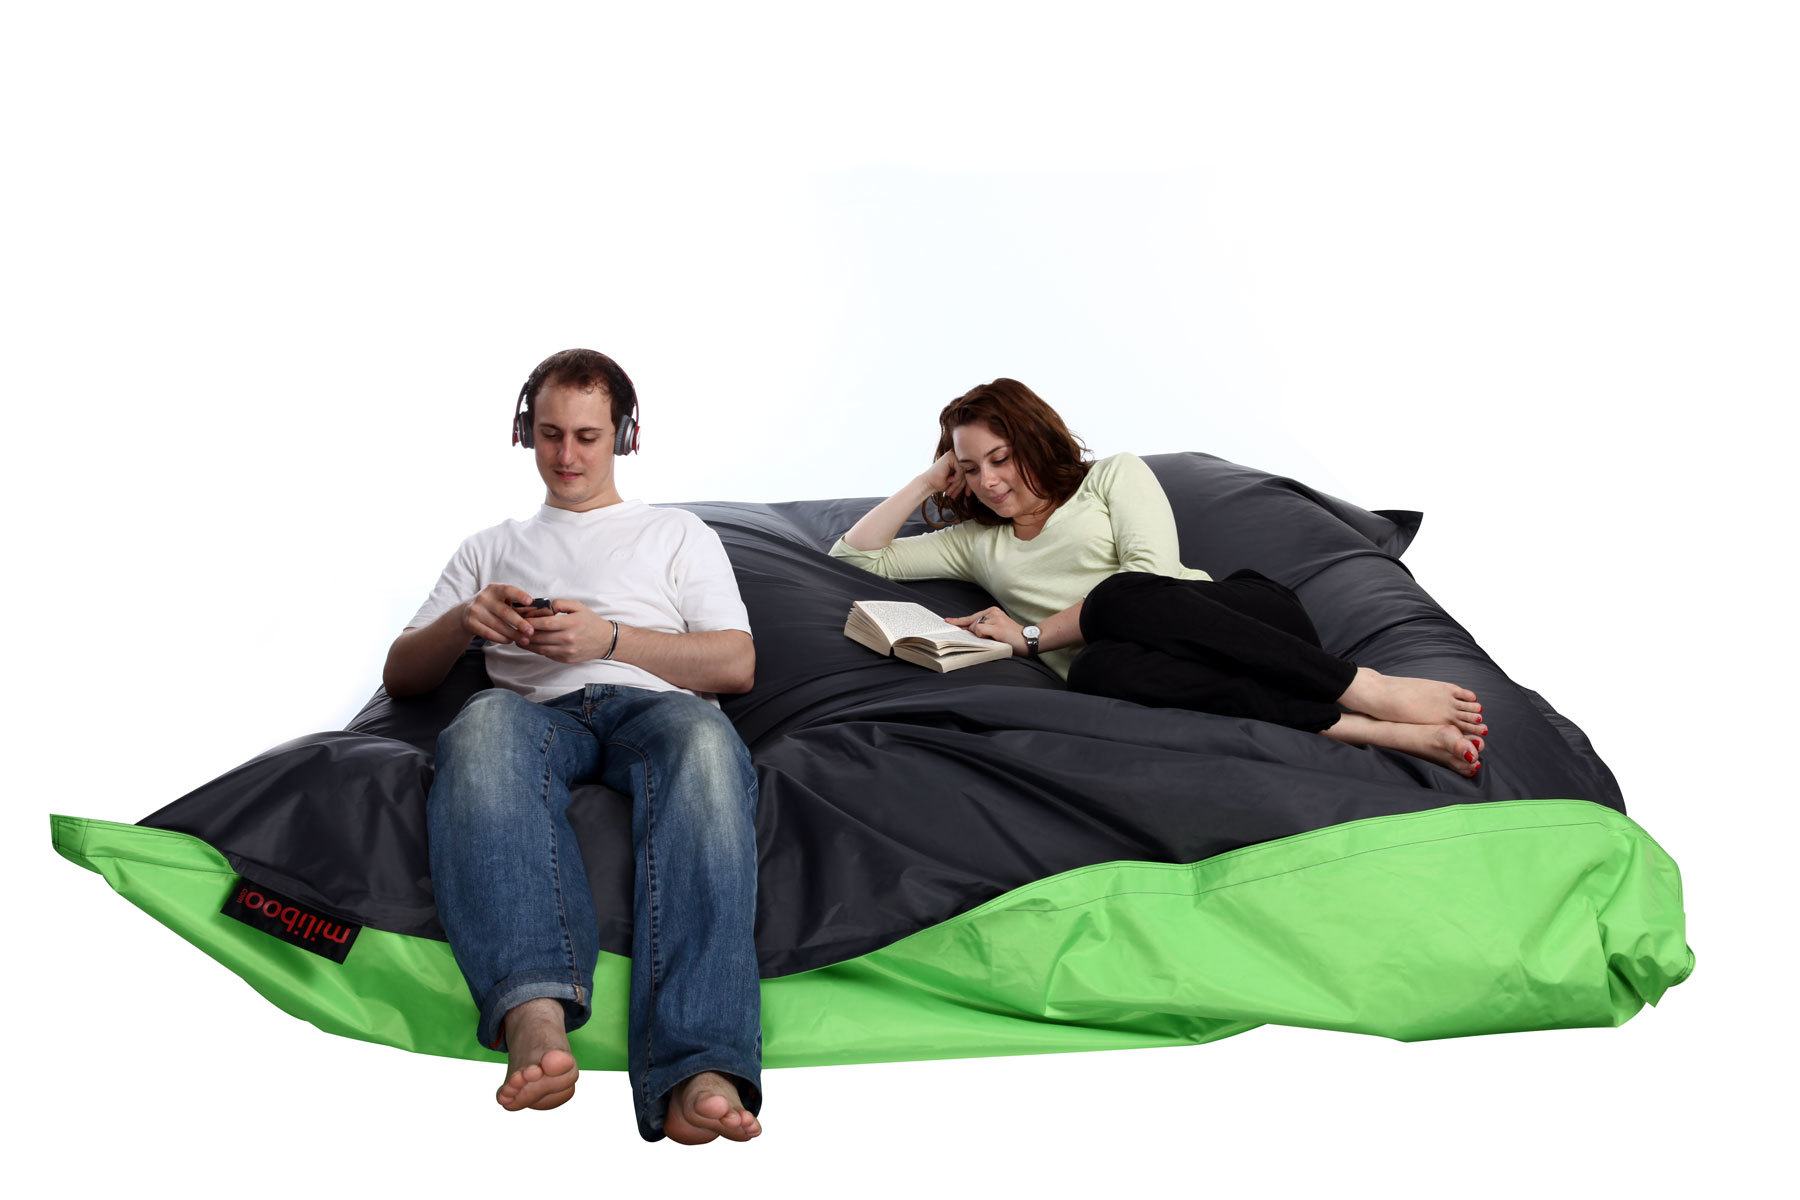 pouf g ant design bicolore vert et gris family milibag miliboo. Black Bedroom Furniture Sets. Home Design Ideas